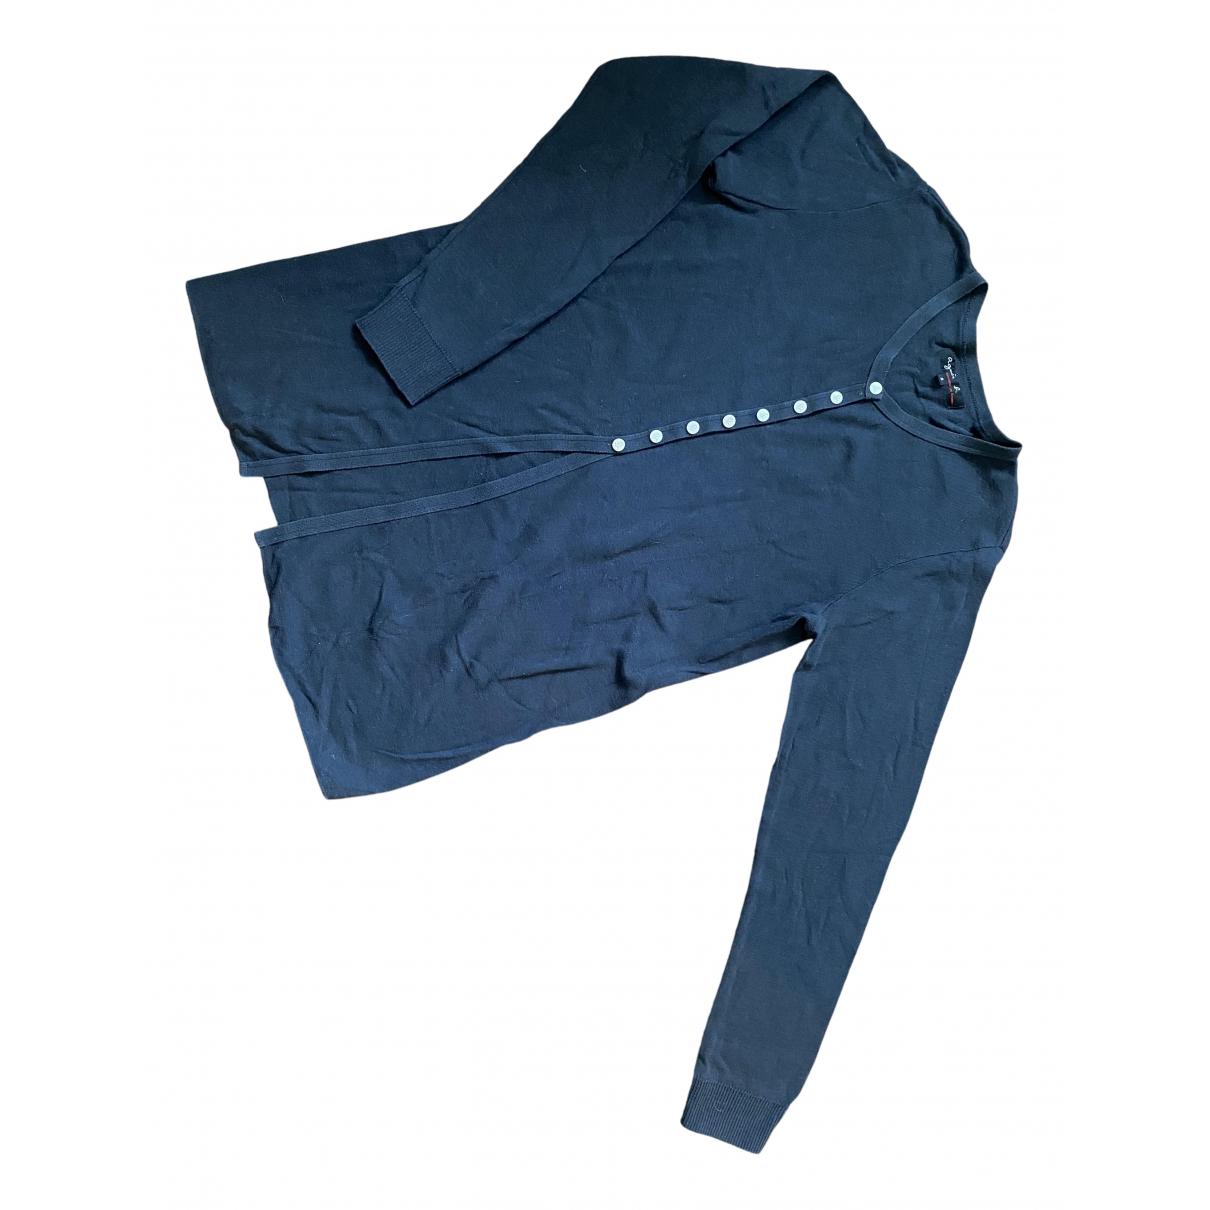 Agnès B. N Anthracite Cotton Knitwear for Women 2 US